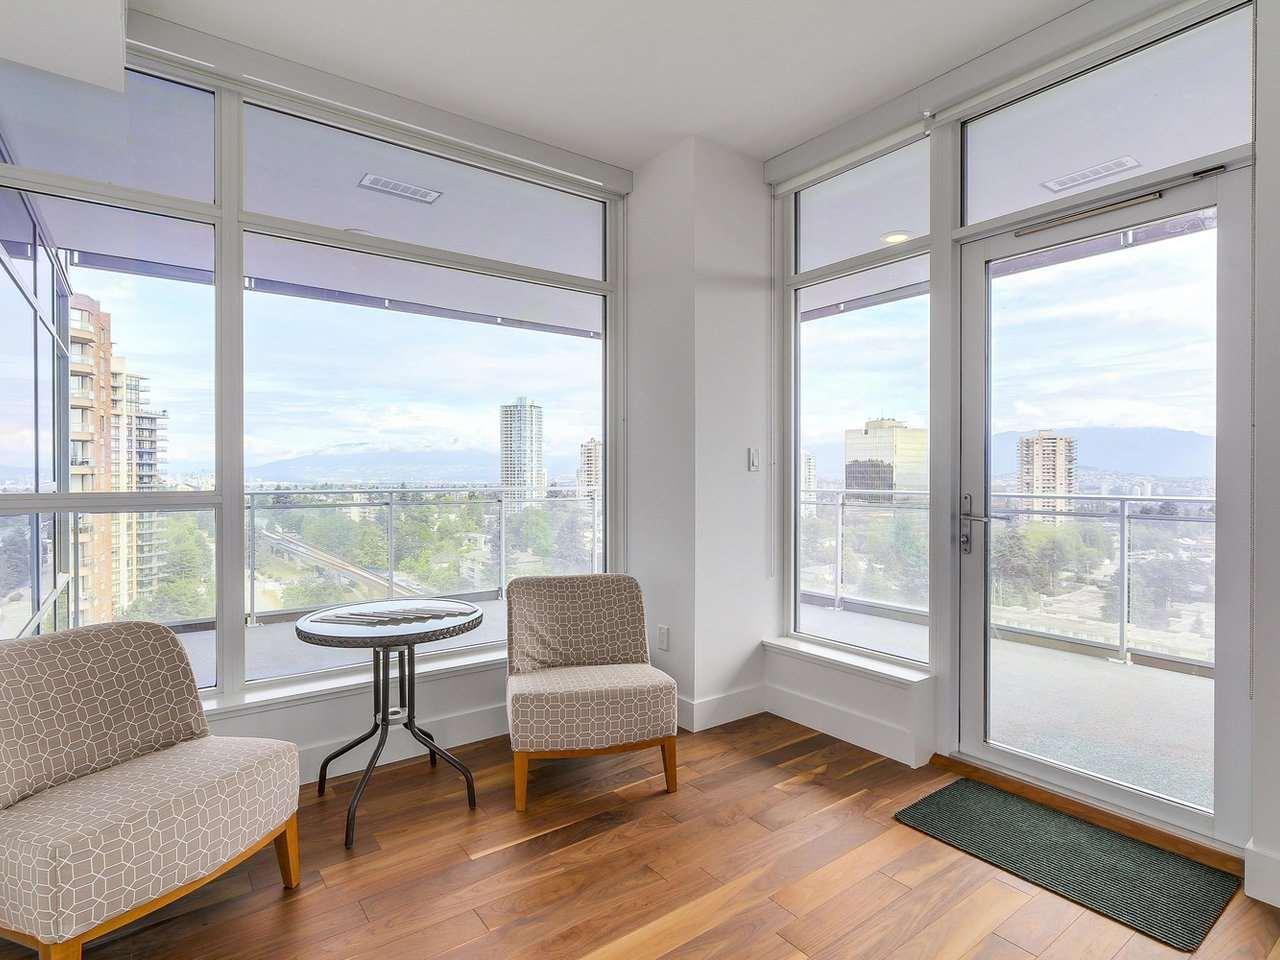 Condo Apartment at 1202 4360 BERESFORD STREET, Unit 1202, Burnaby South, British Columbia. Image 8